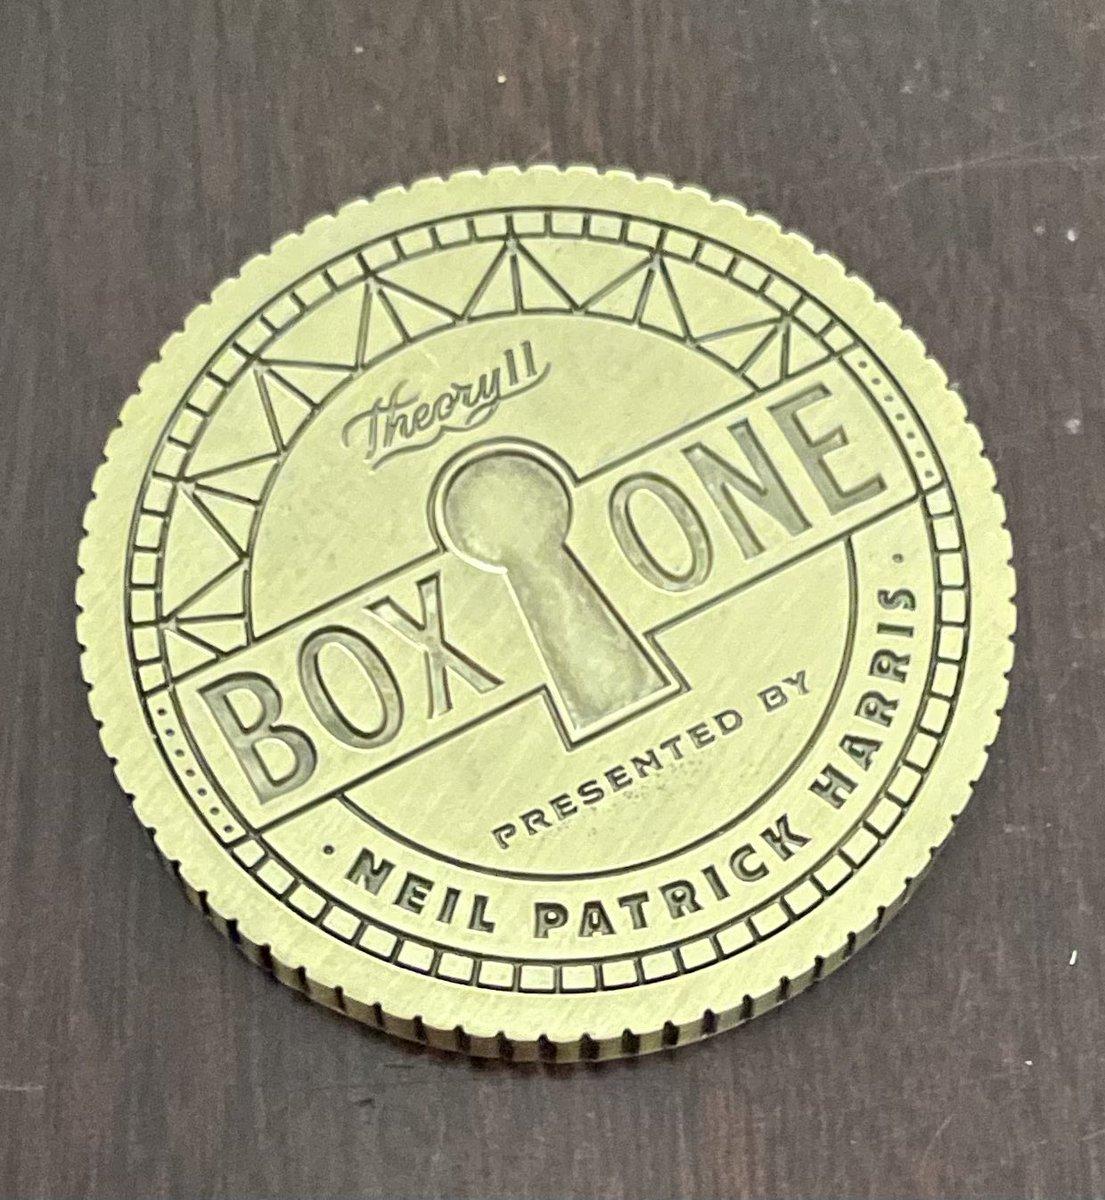 @ActuallyNPH @theory11 #theory11 #BoxOne